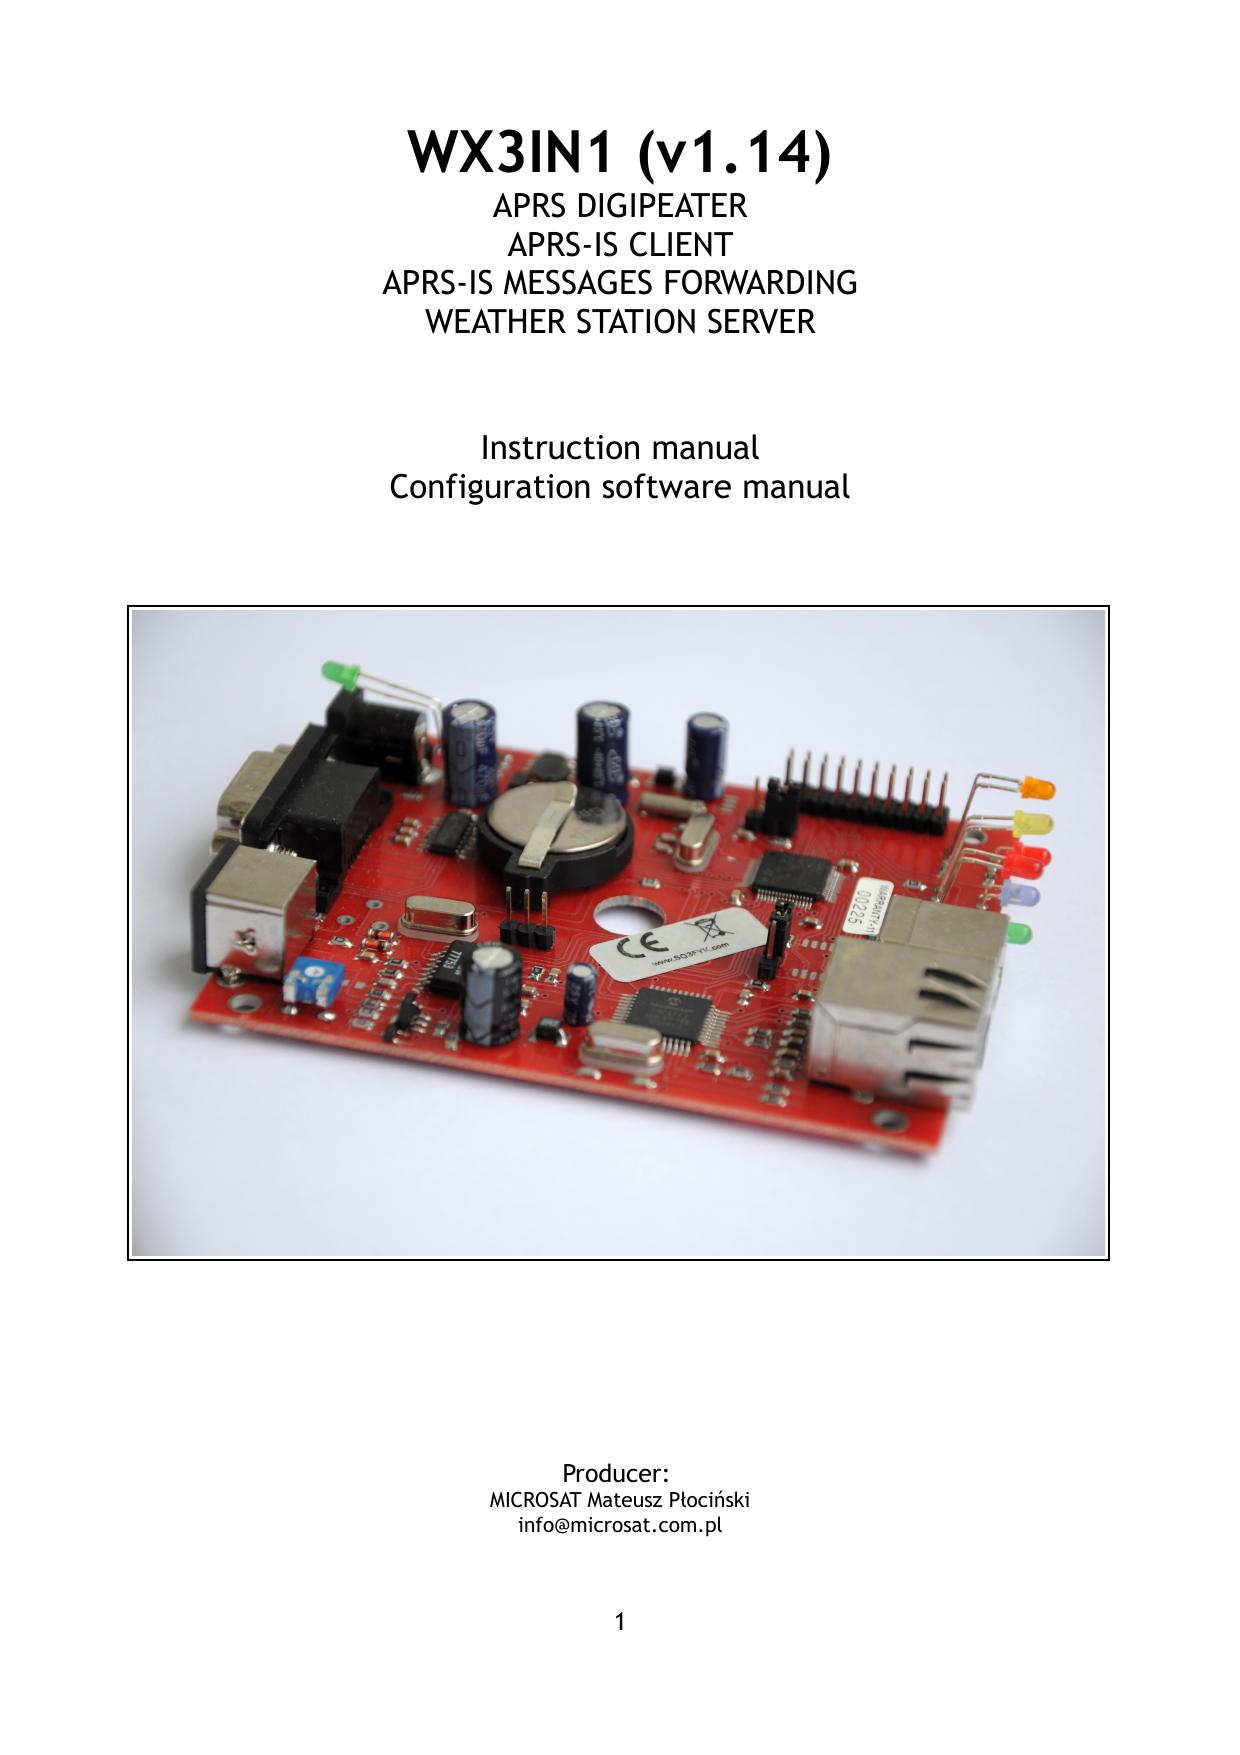 WX3IN1 - Microsat | manualzz com